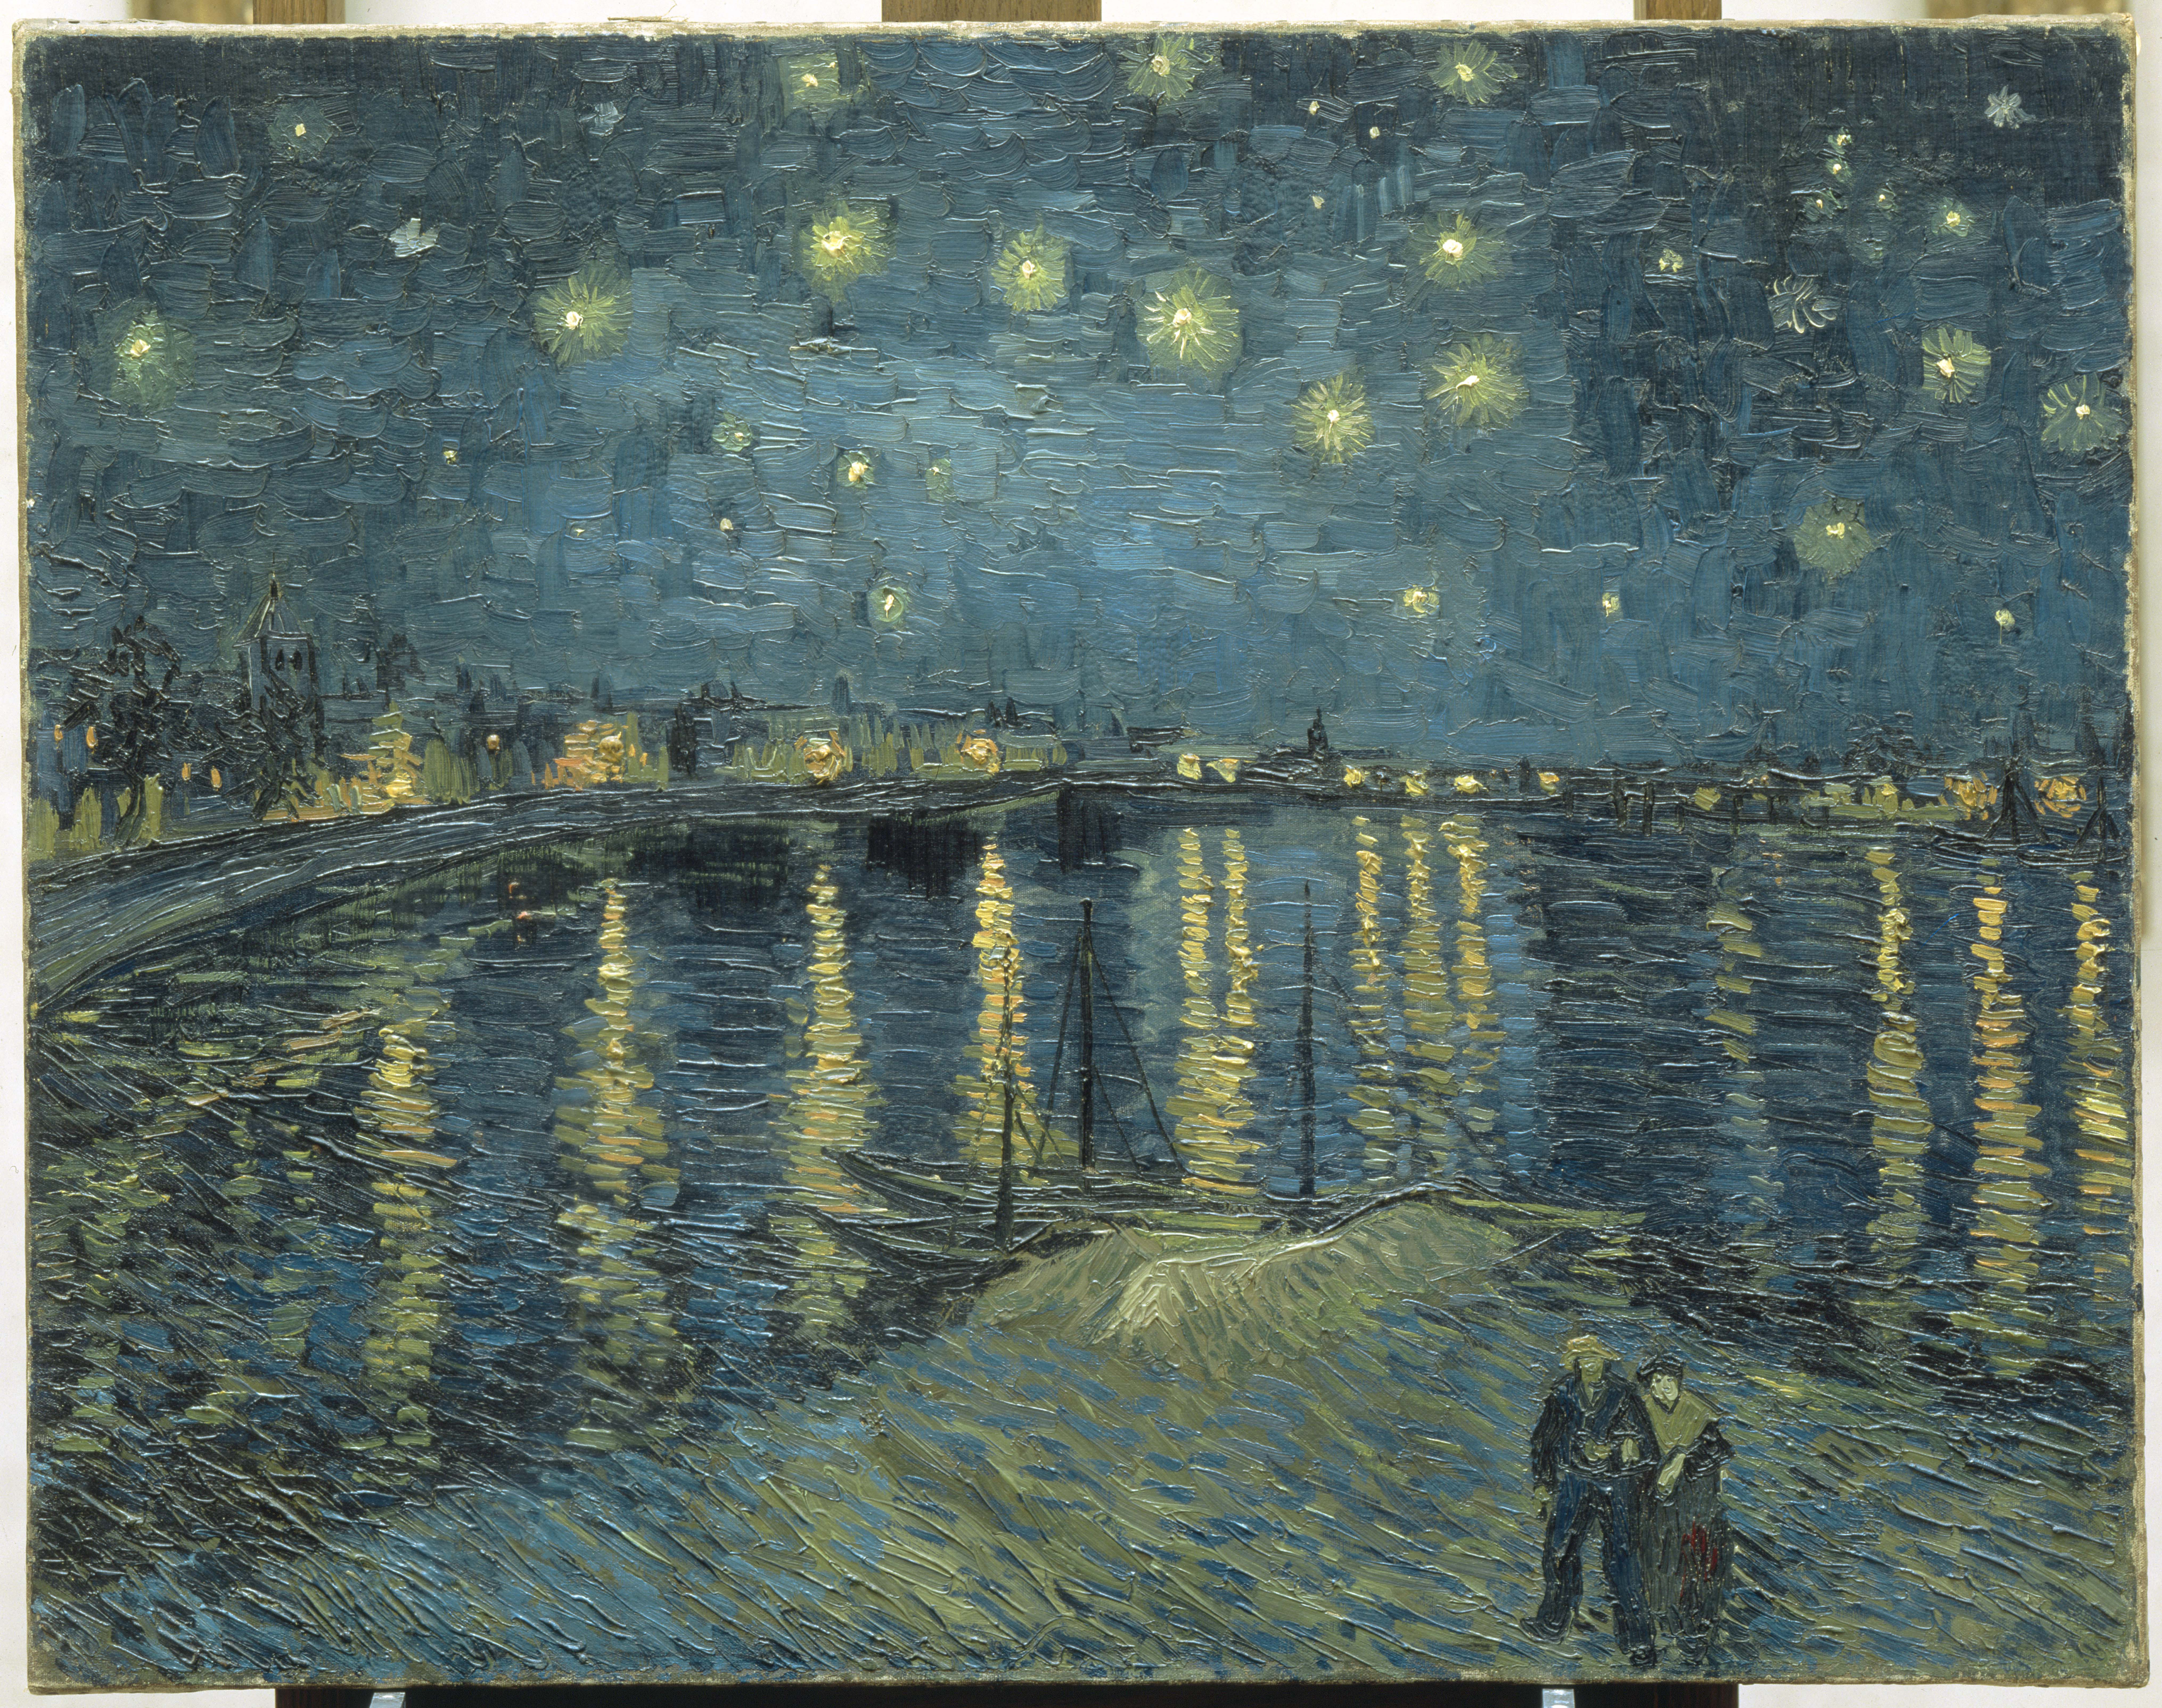 van-gogh-vincent_la-nuit-etoilee-starry-night-over-the-rhone_1888bis